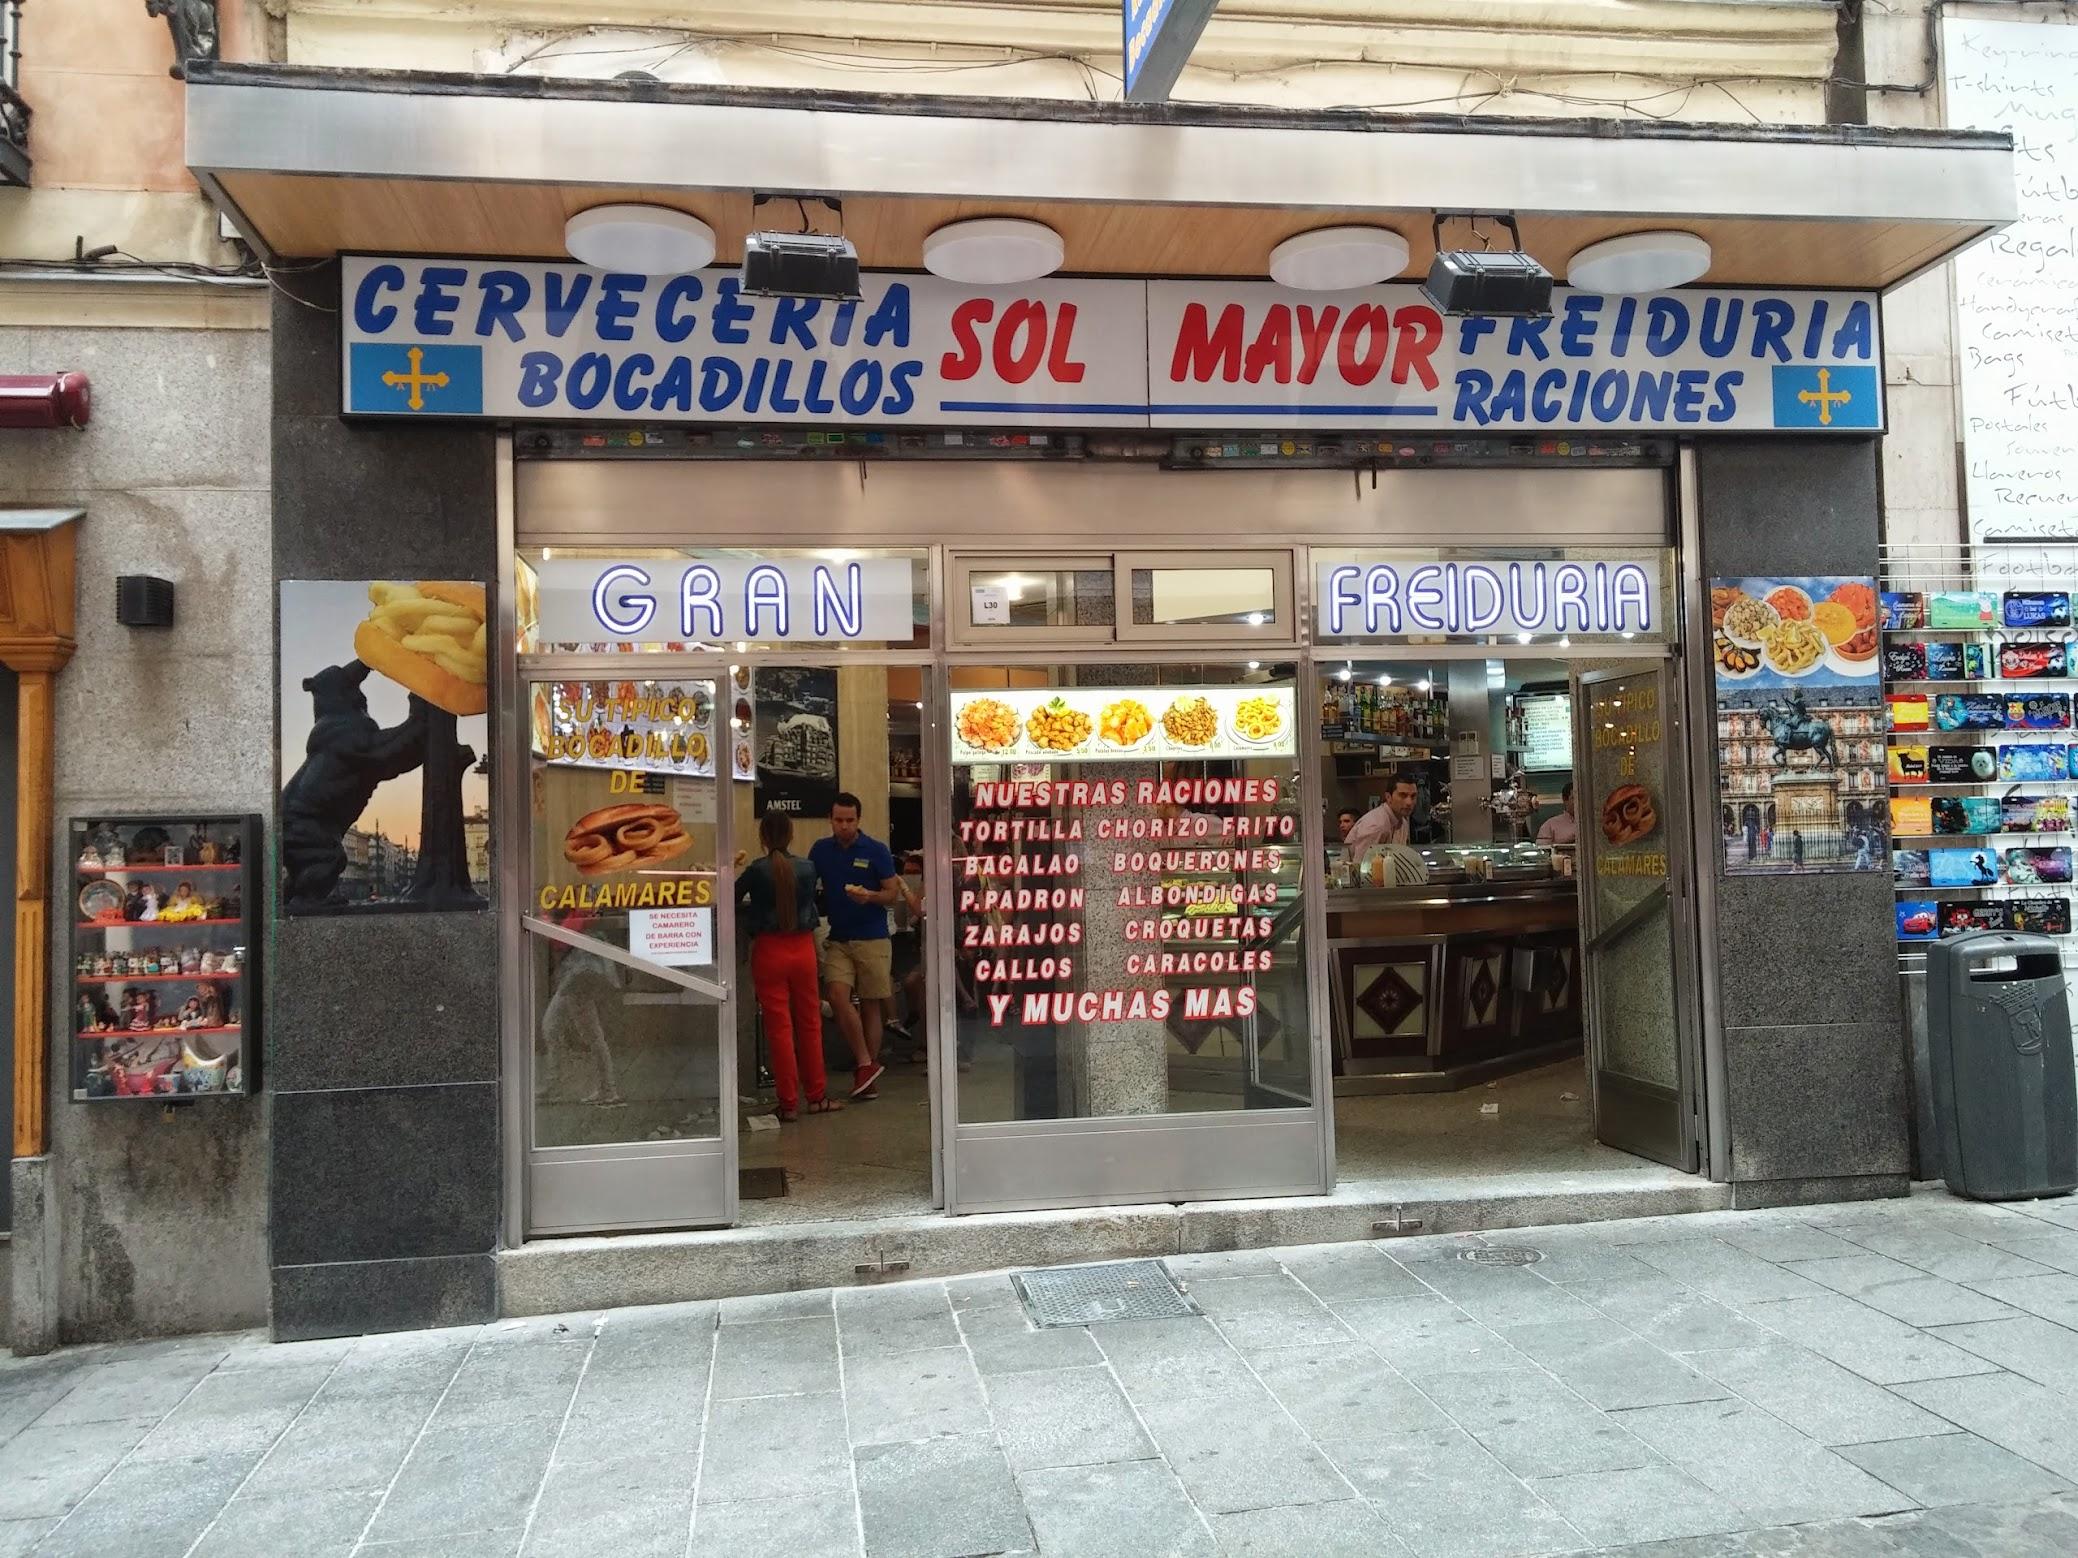 Cerveceria Sol Mayor